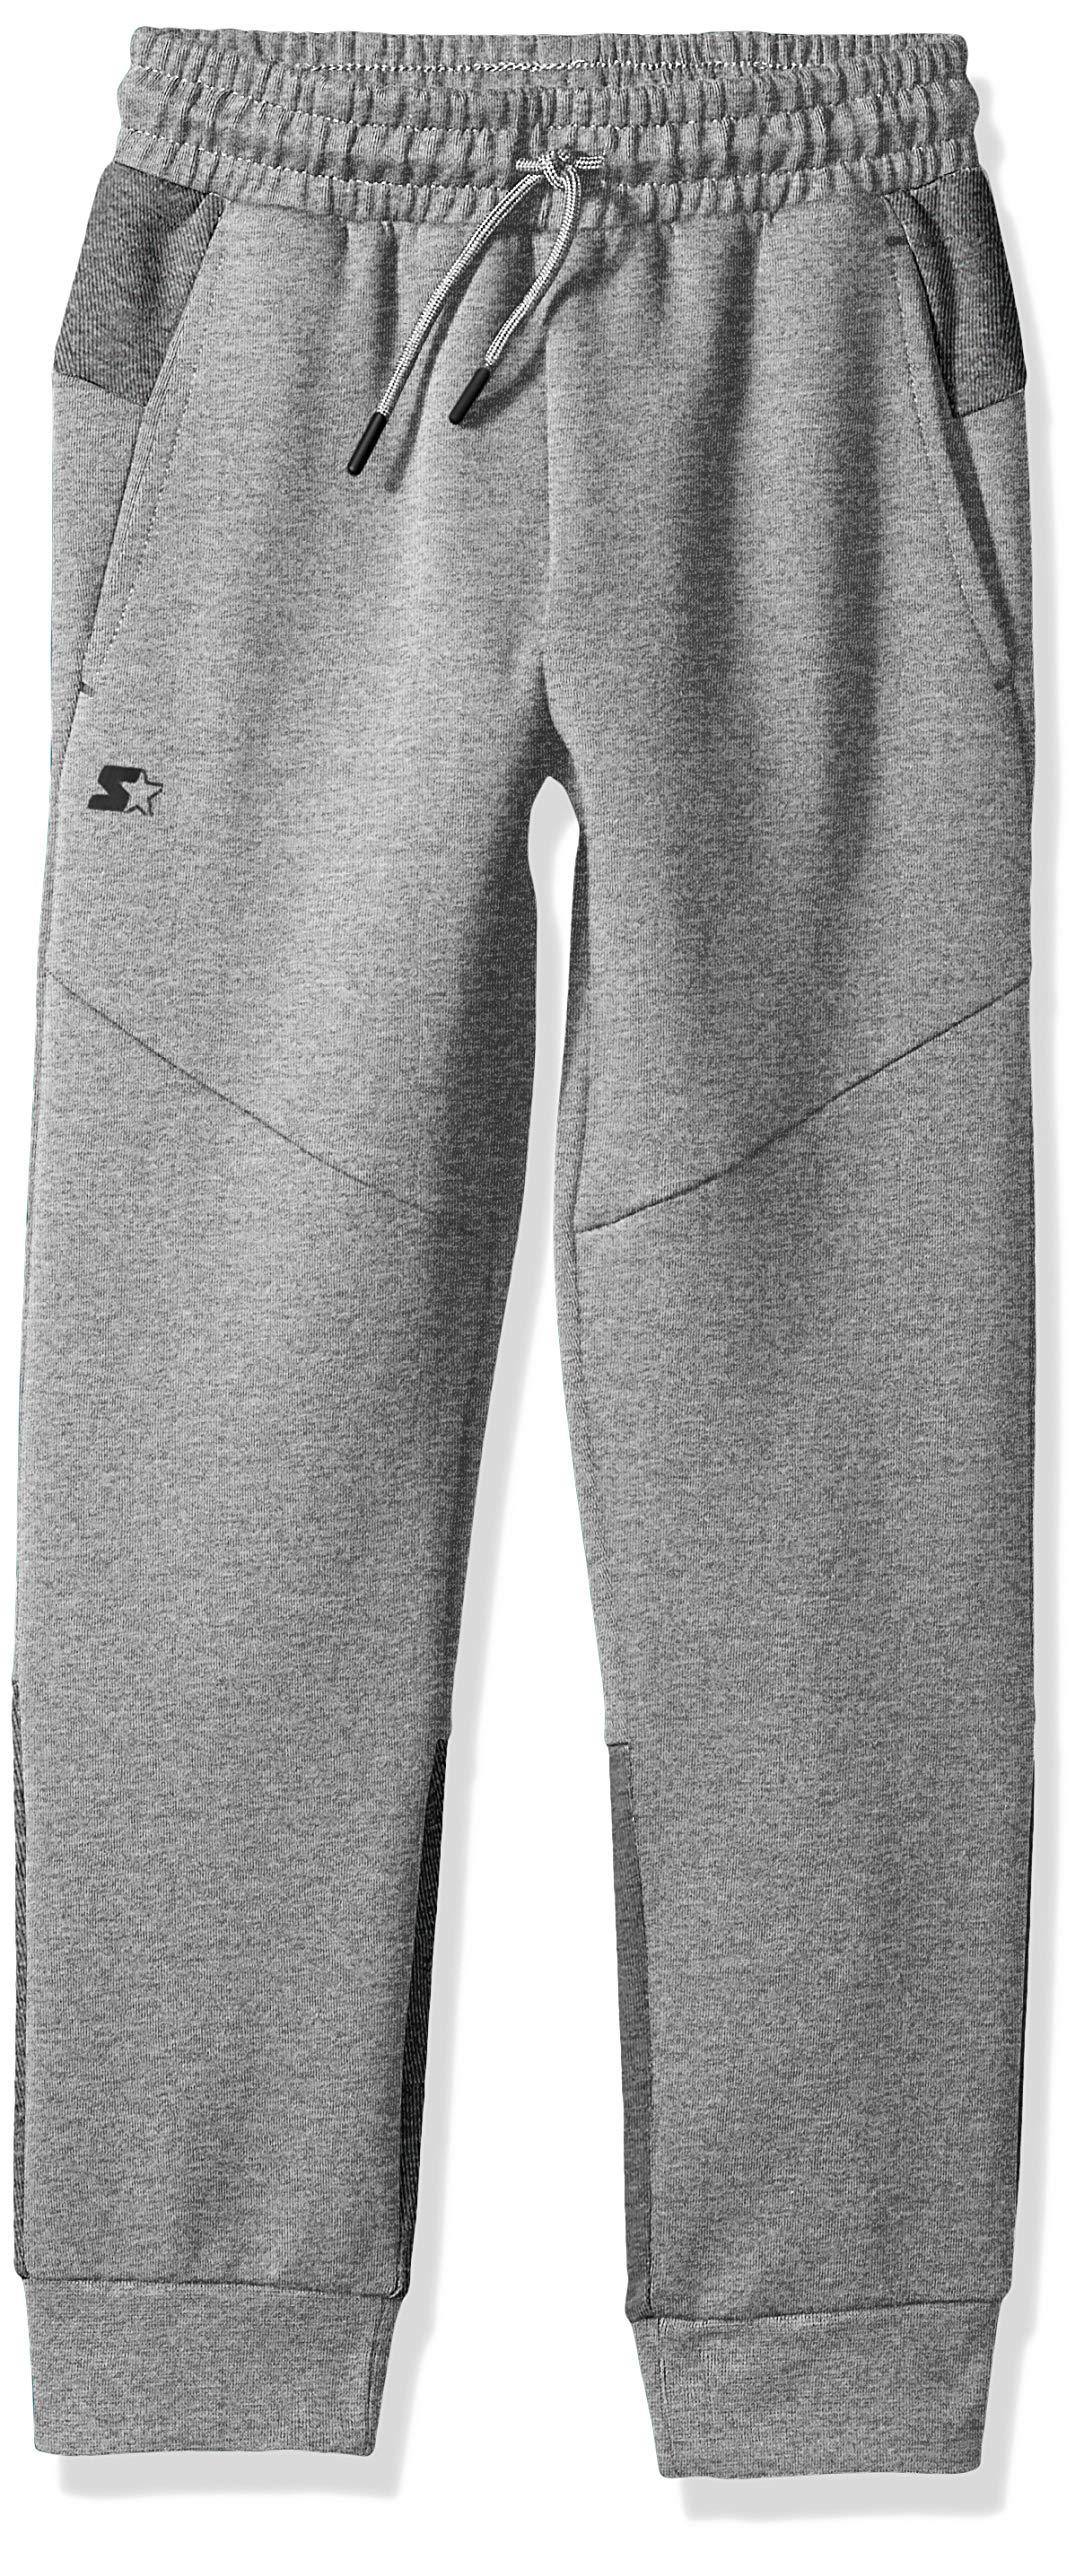 Starter Boys' Double Knit Colorblocked Jogger Sweatpants, Amazon Exclusive, Vapor Grey Heather, L